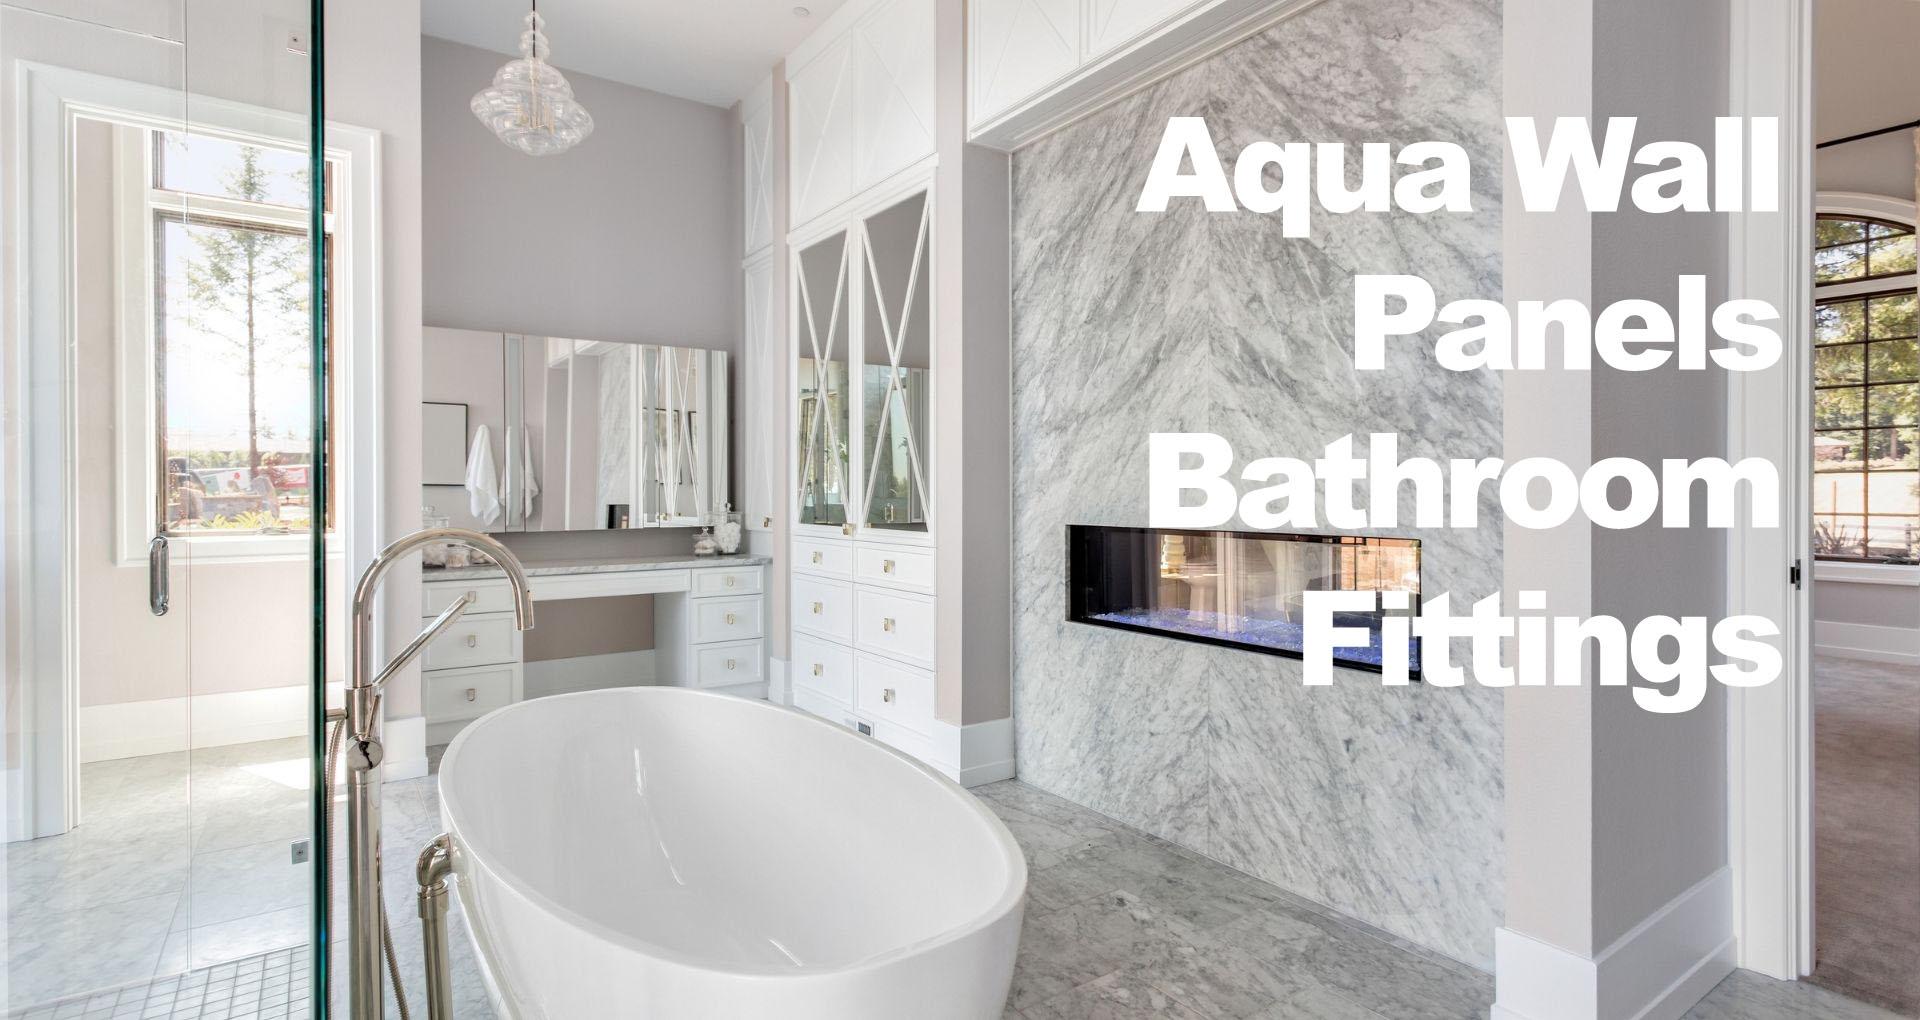 Aqua Wall Panels Bathroom Fittings